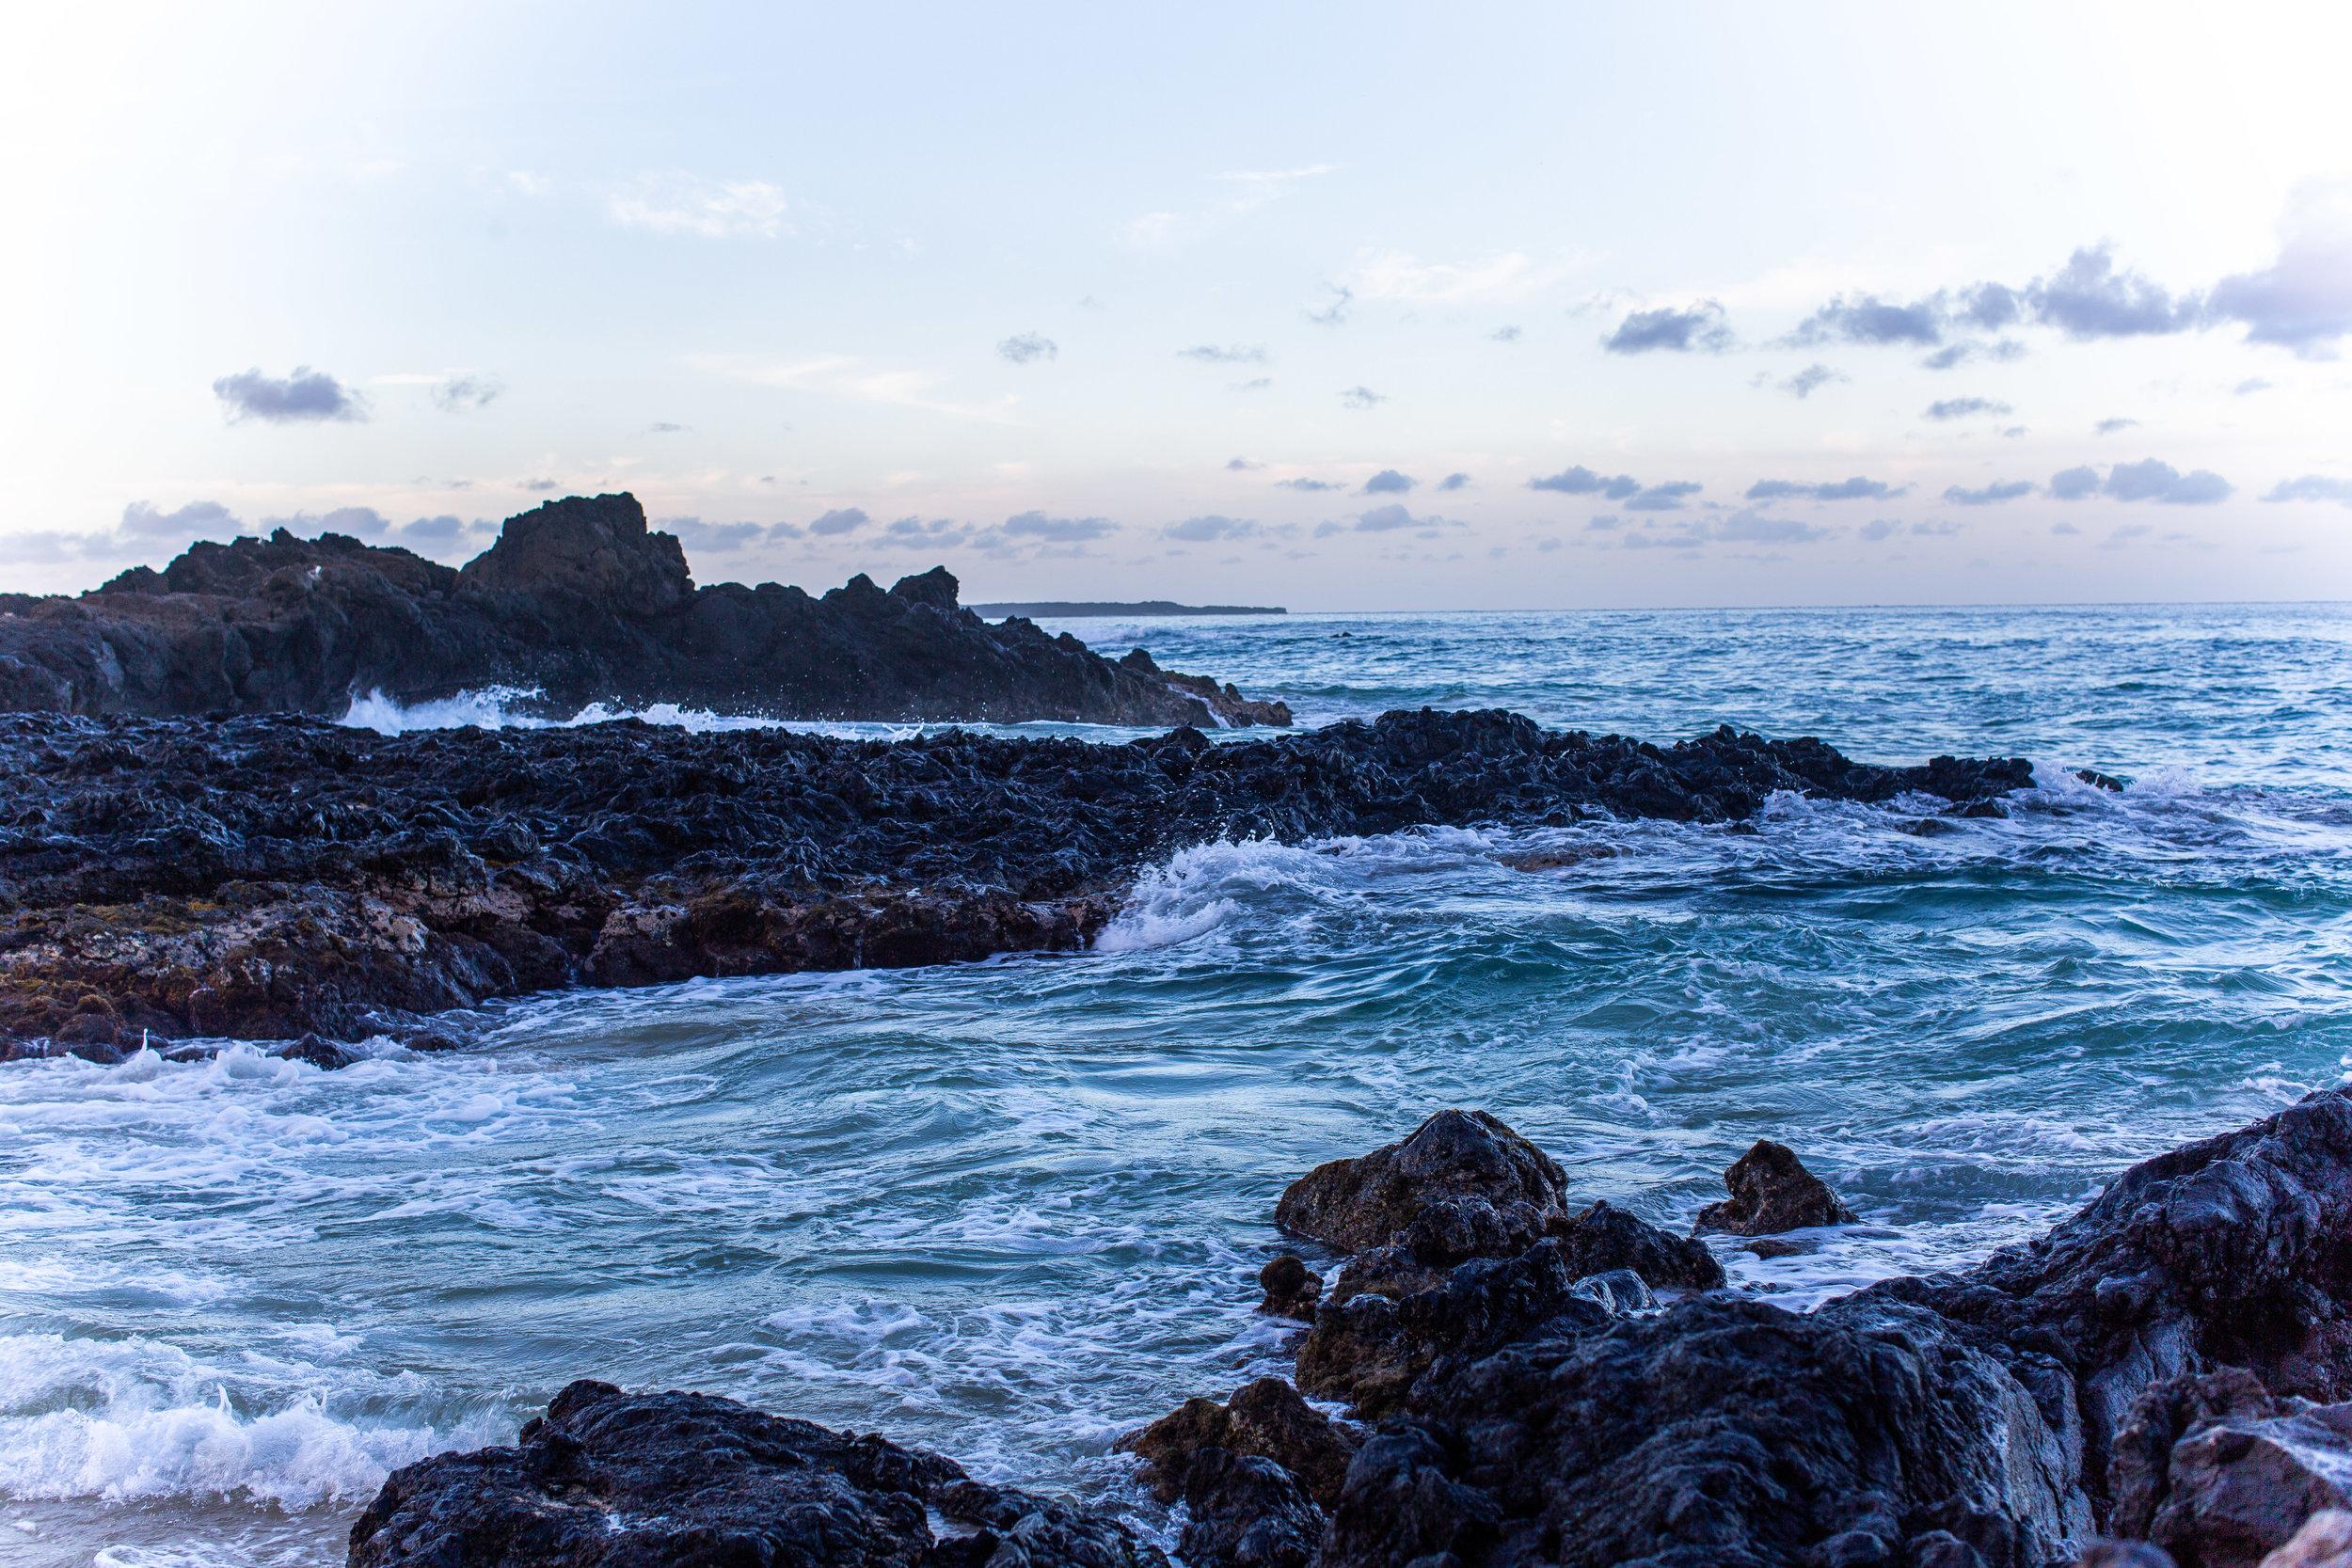 fizz-fade-hawaii-sunrise-stripes2-80.jpg